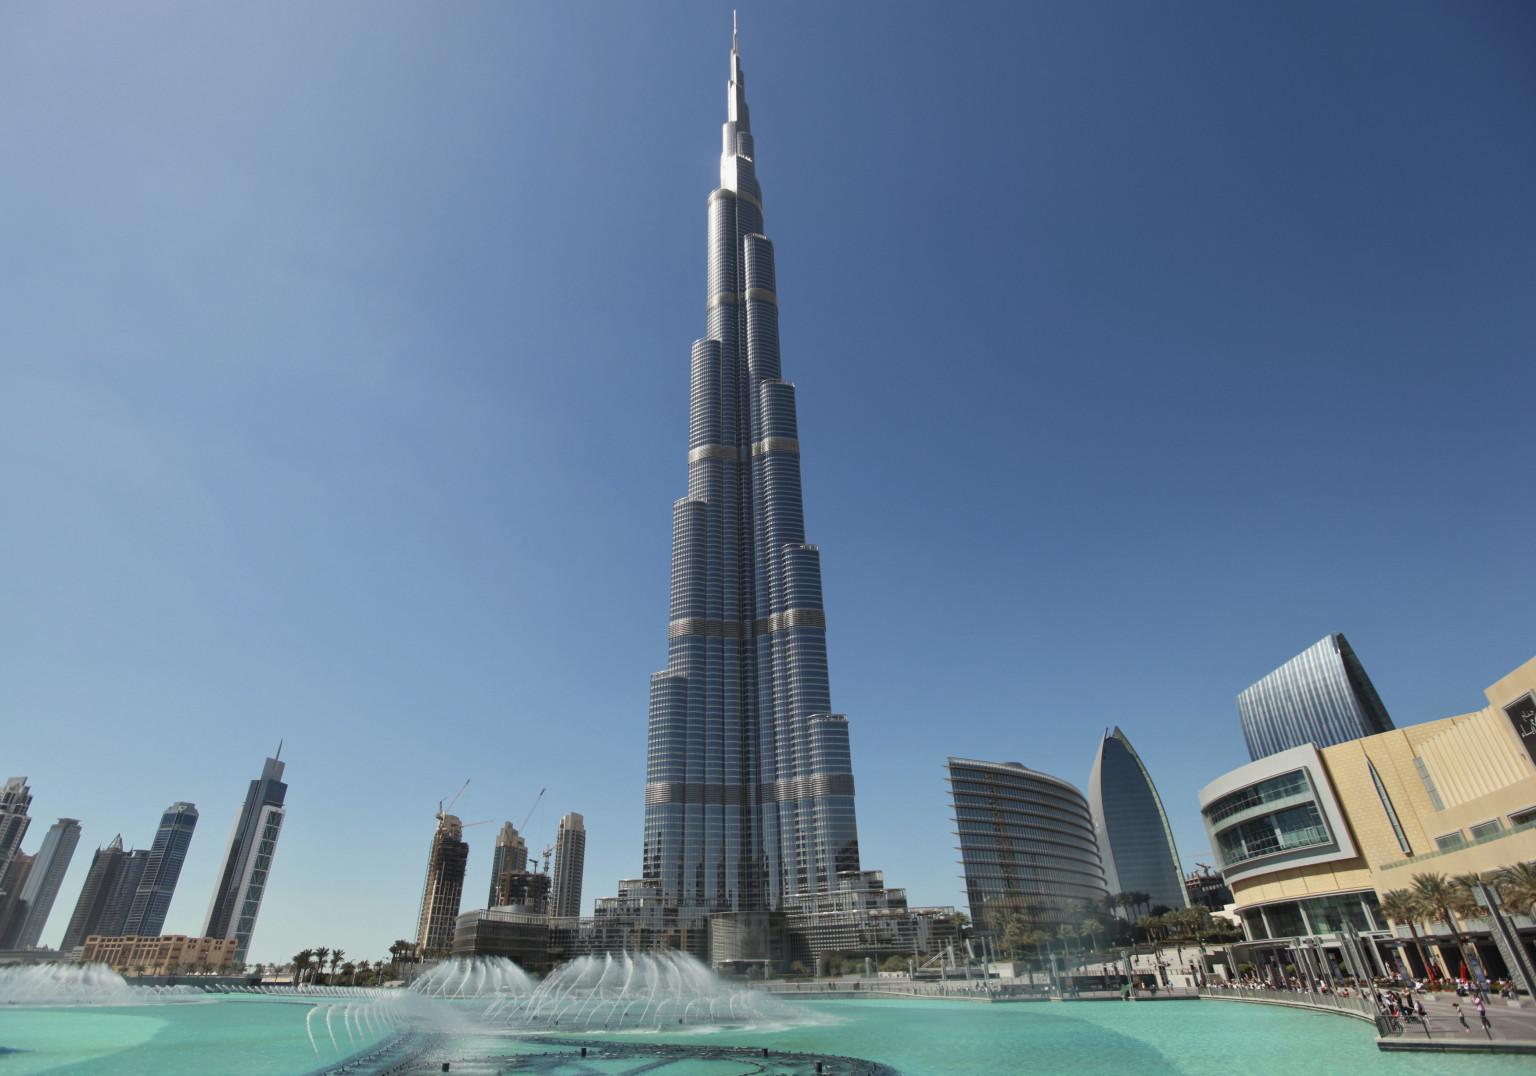 The Burj Khalifa stands in Dubai